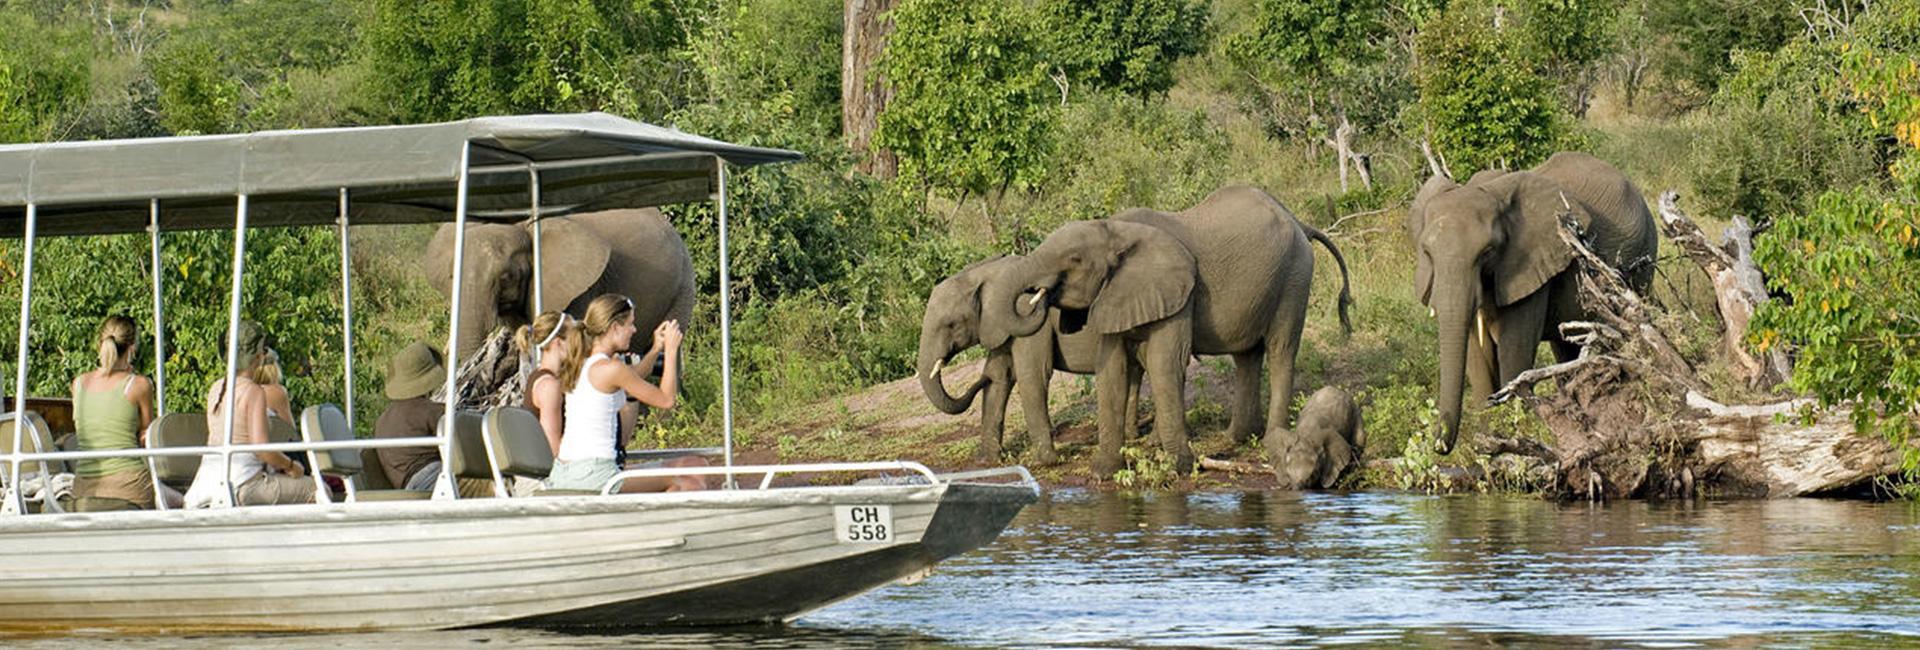 chobe-chilwero-elephants-cruise-botswana